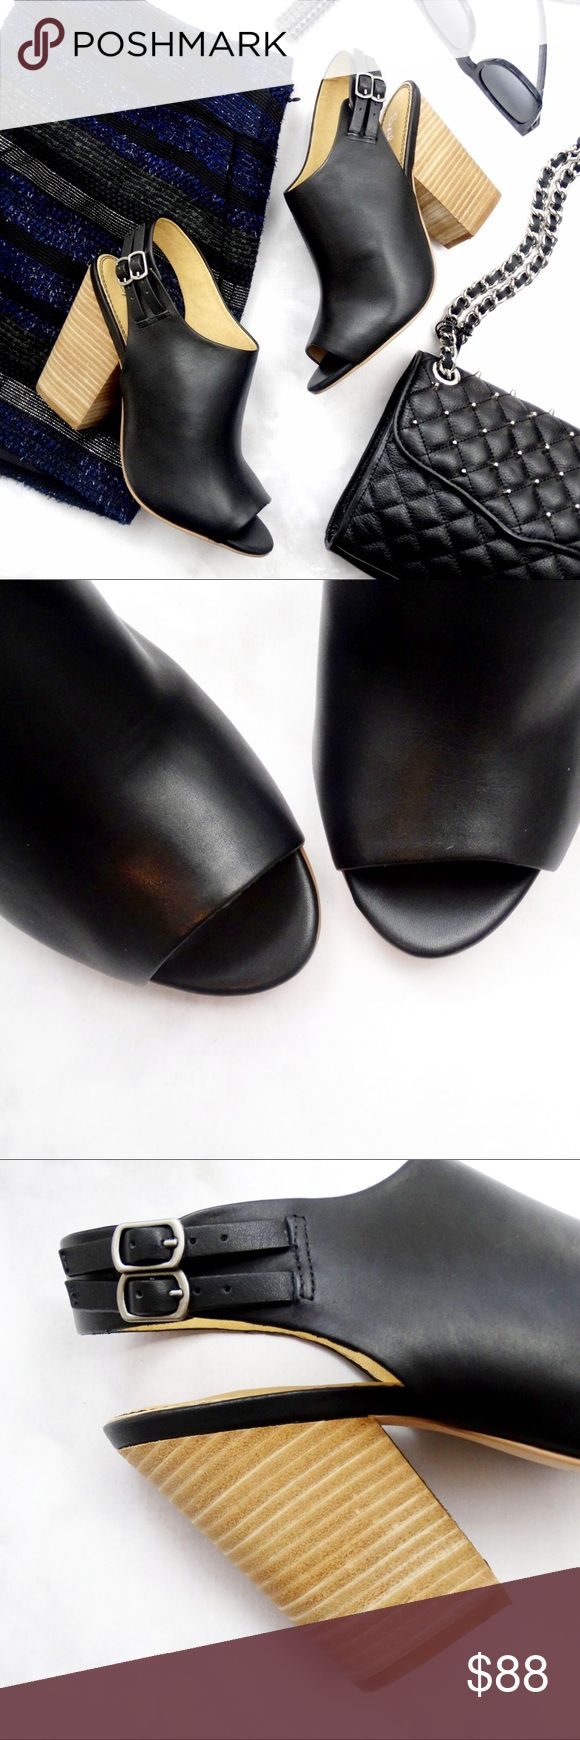 "Black Open Toe Slingback Block Heel Sandals Details: * Size 8 * Leather * Slingback * 4.25"" heel * New in box  04011707 Splendid Shoes Sandals"